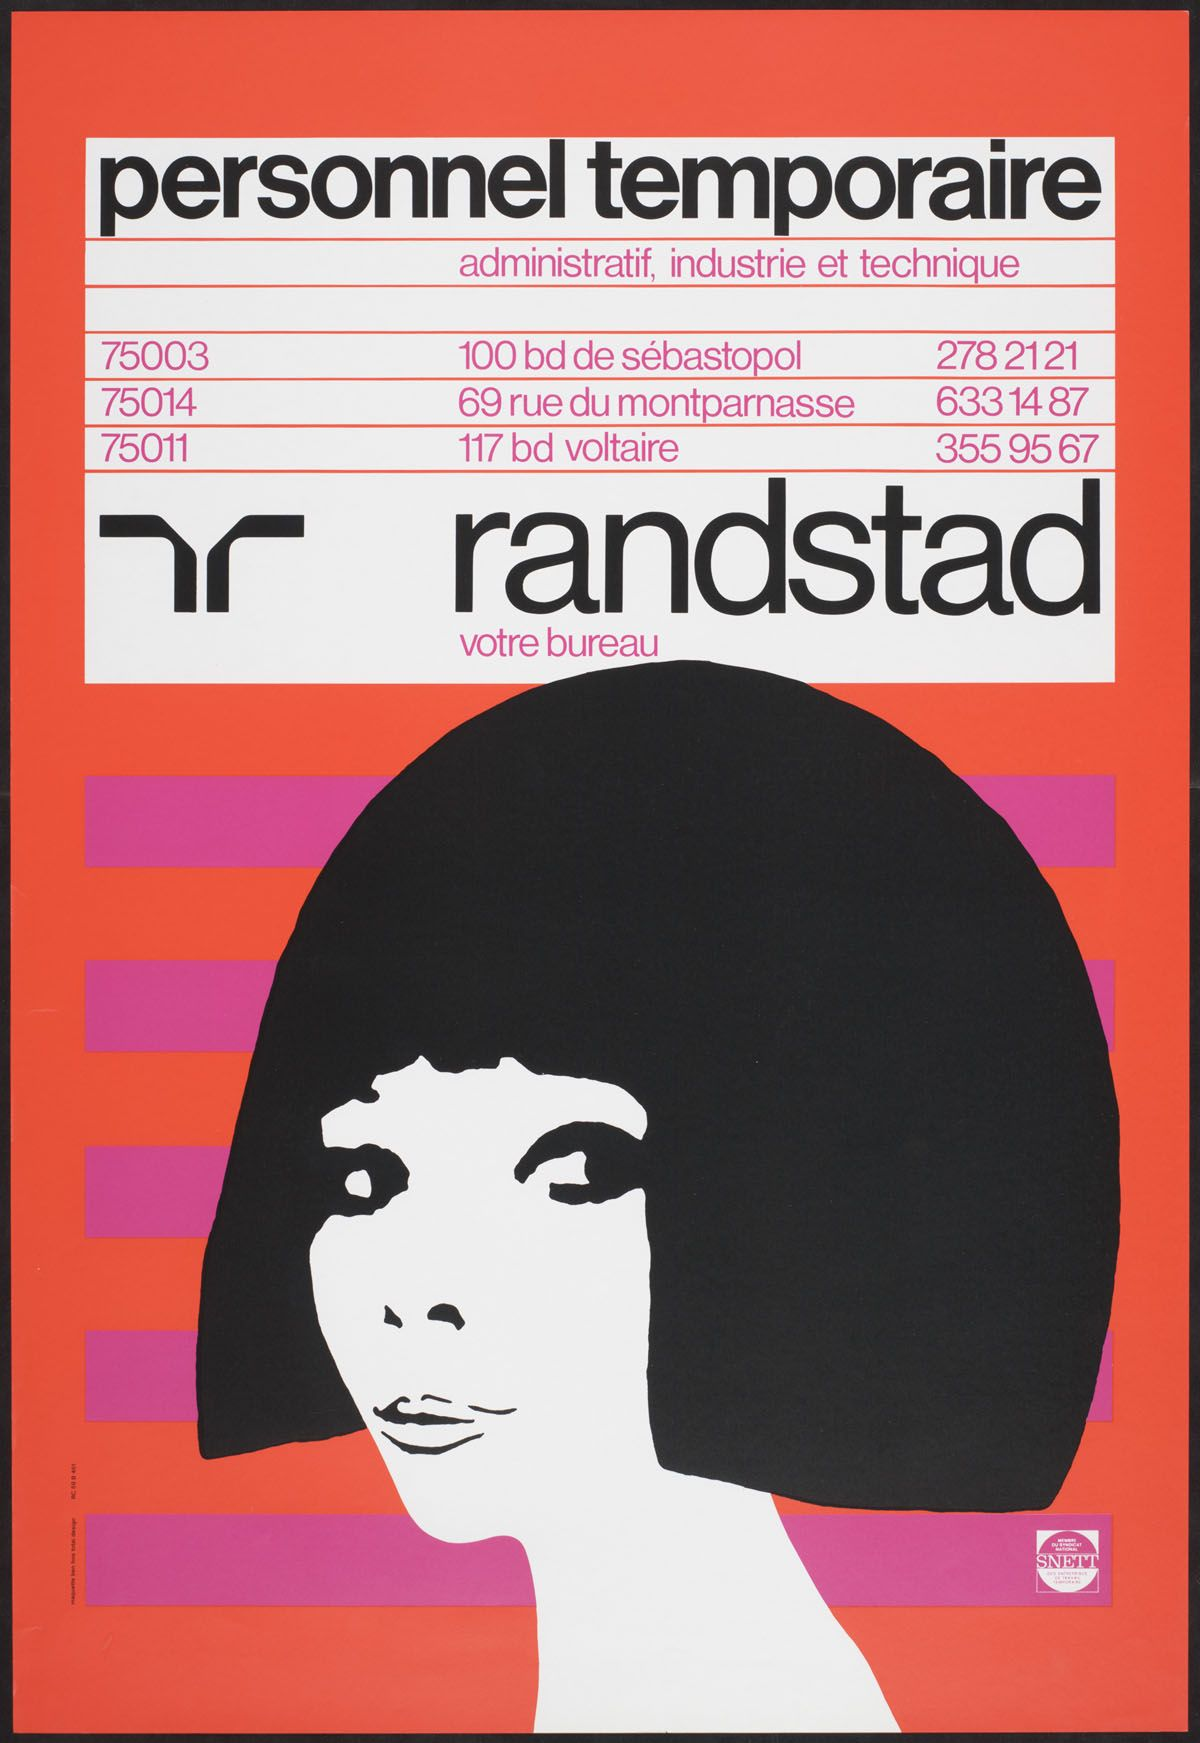 Book Cover Design Reference : Randstad personnel temporaire ben bos design